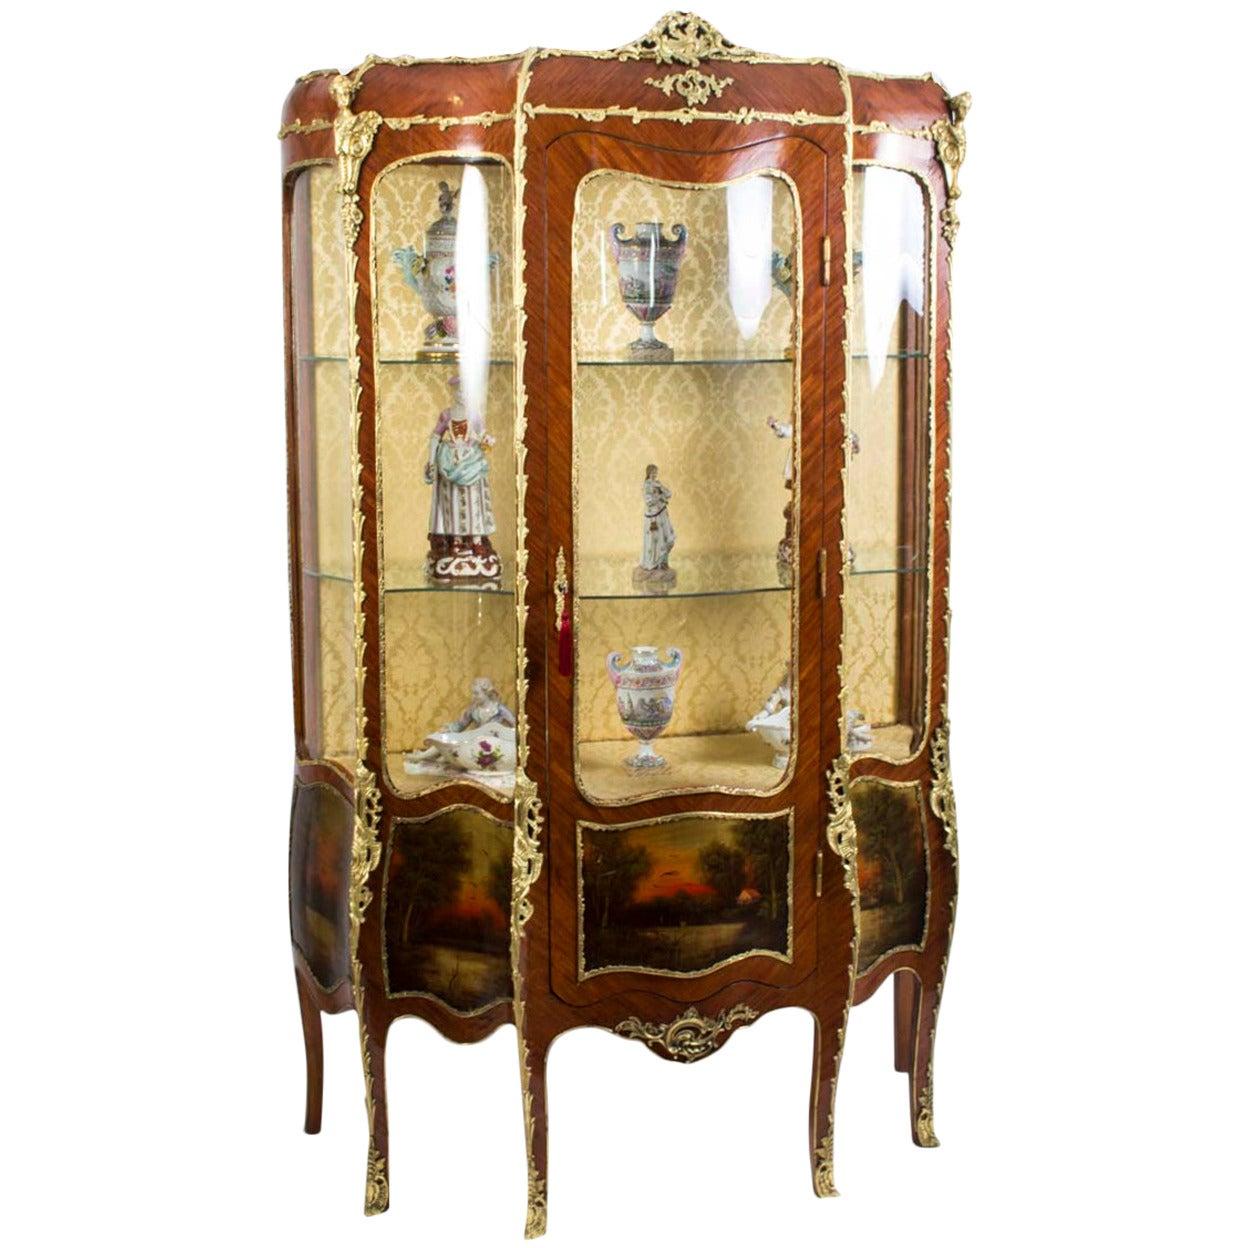 antique french kingwood vernis martin vitrine circa 1880 at 1stdibs. Black Bedroom Furniture Sets. Home Design Ideas